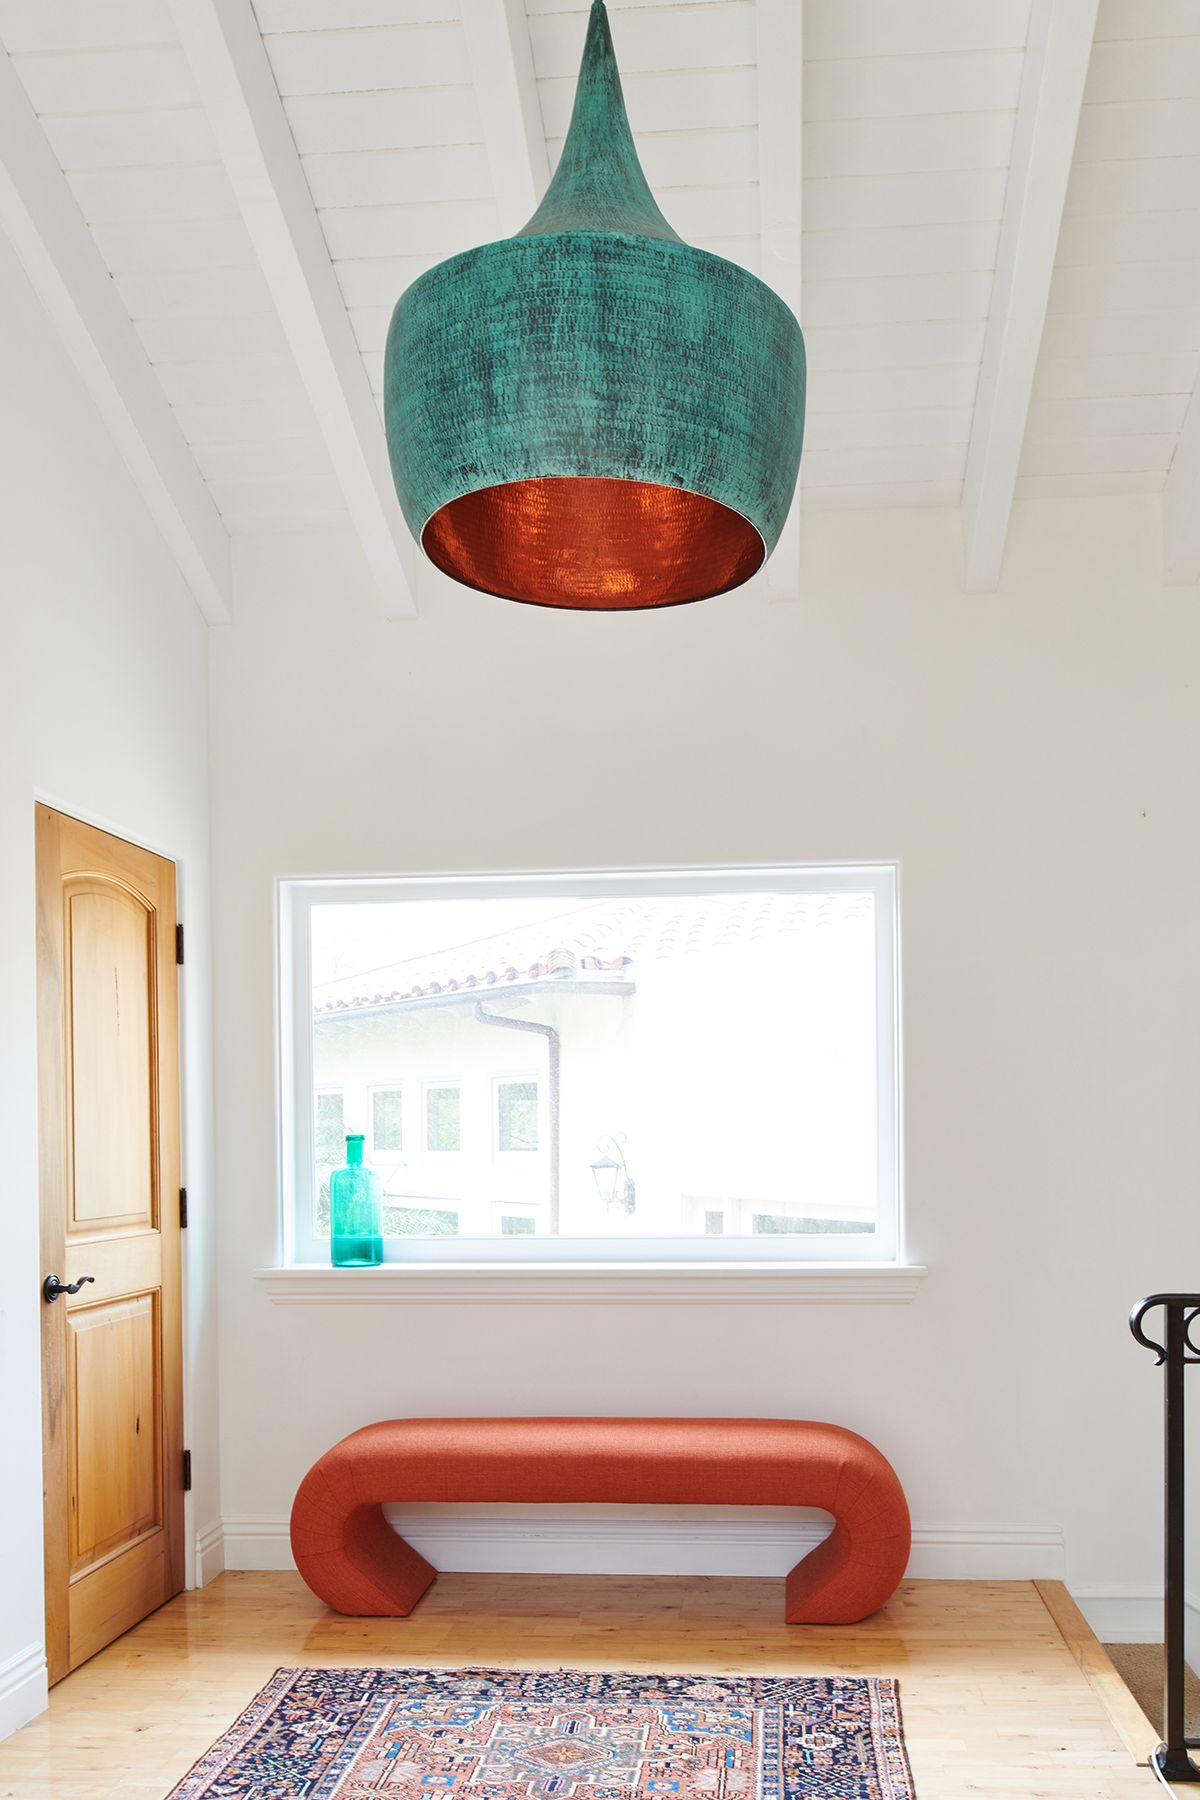 155 Interior Photography Portfolio of Architectural Photographer Peter Christiansen Valli - Ashley Morgan - Broad Beach.jpg